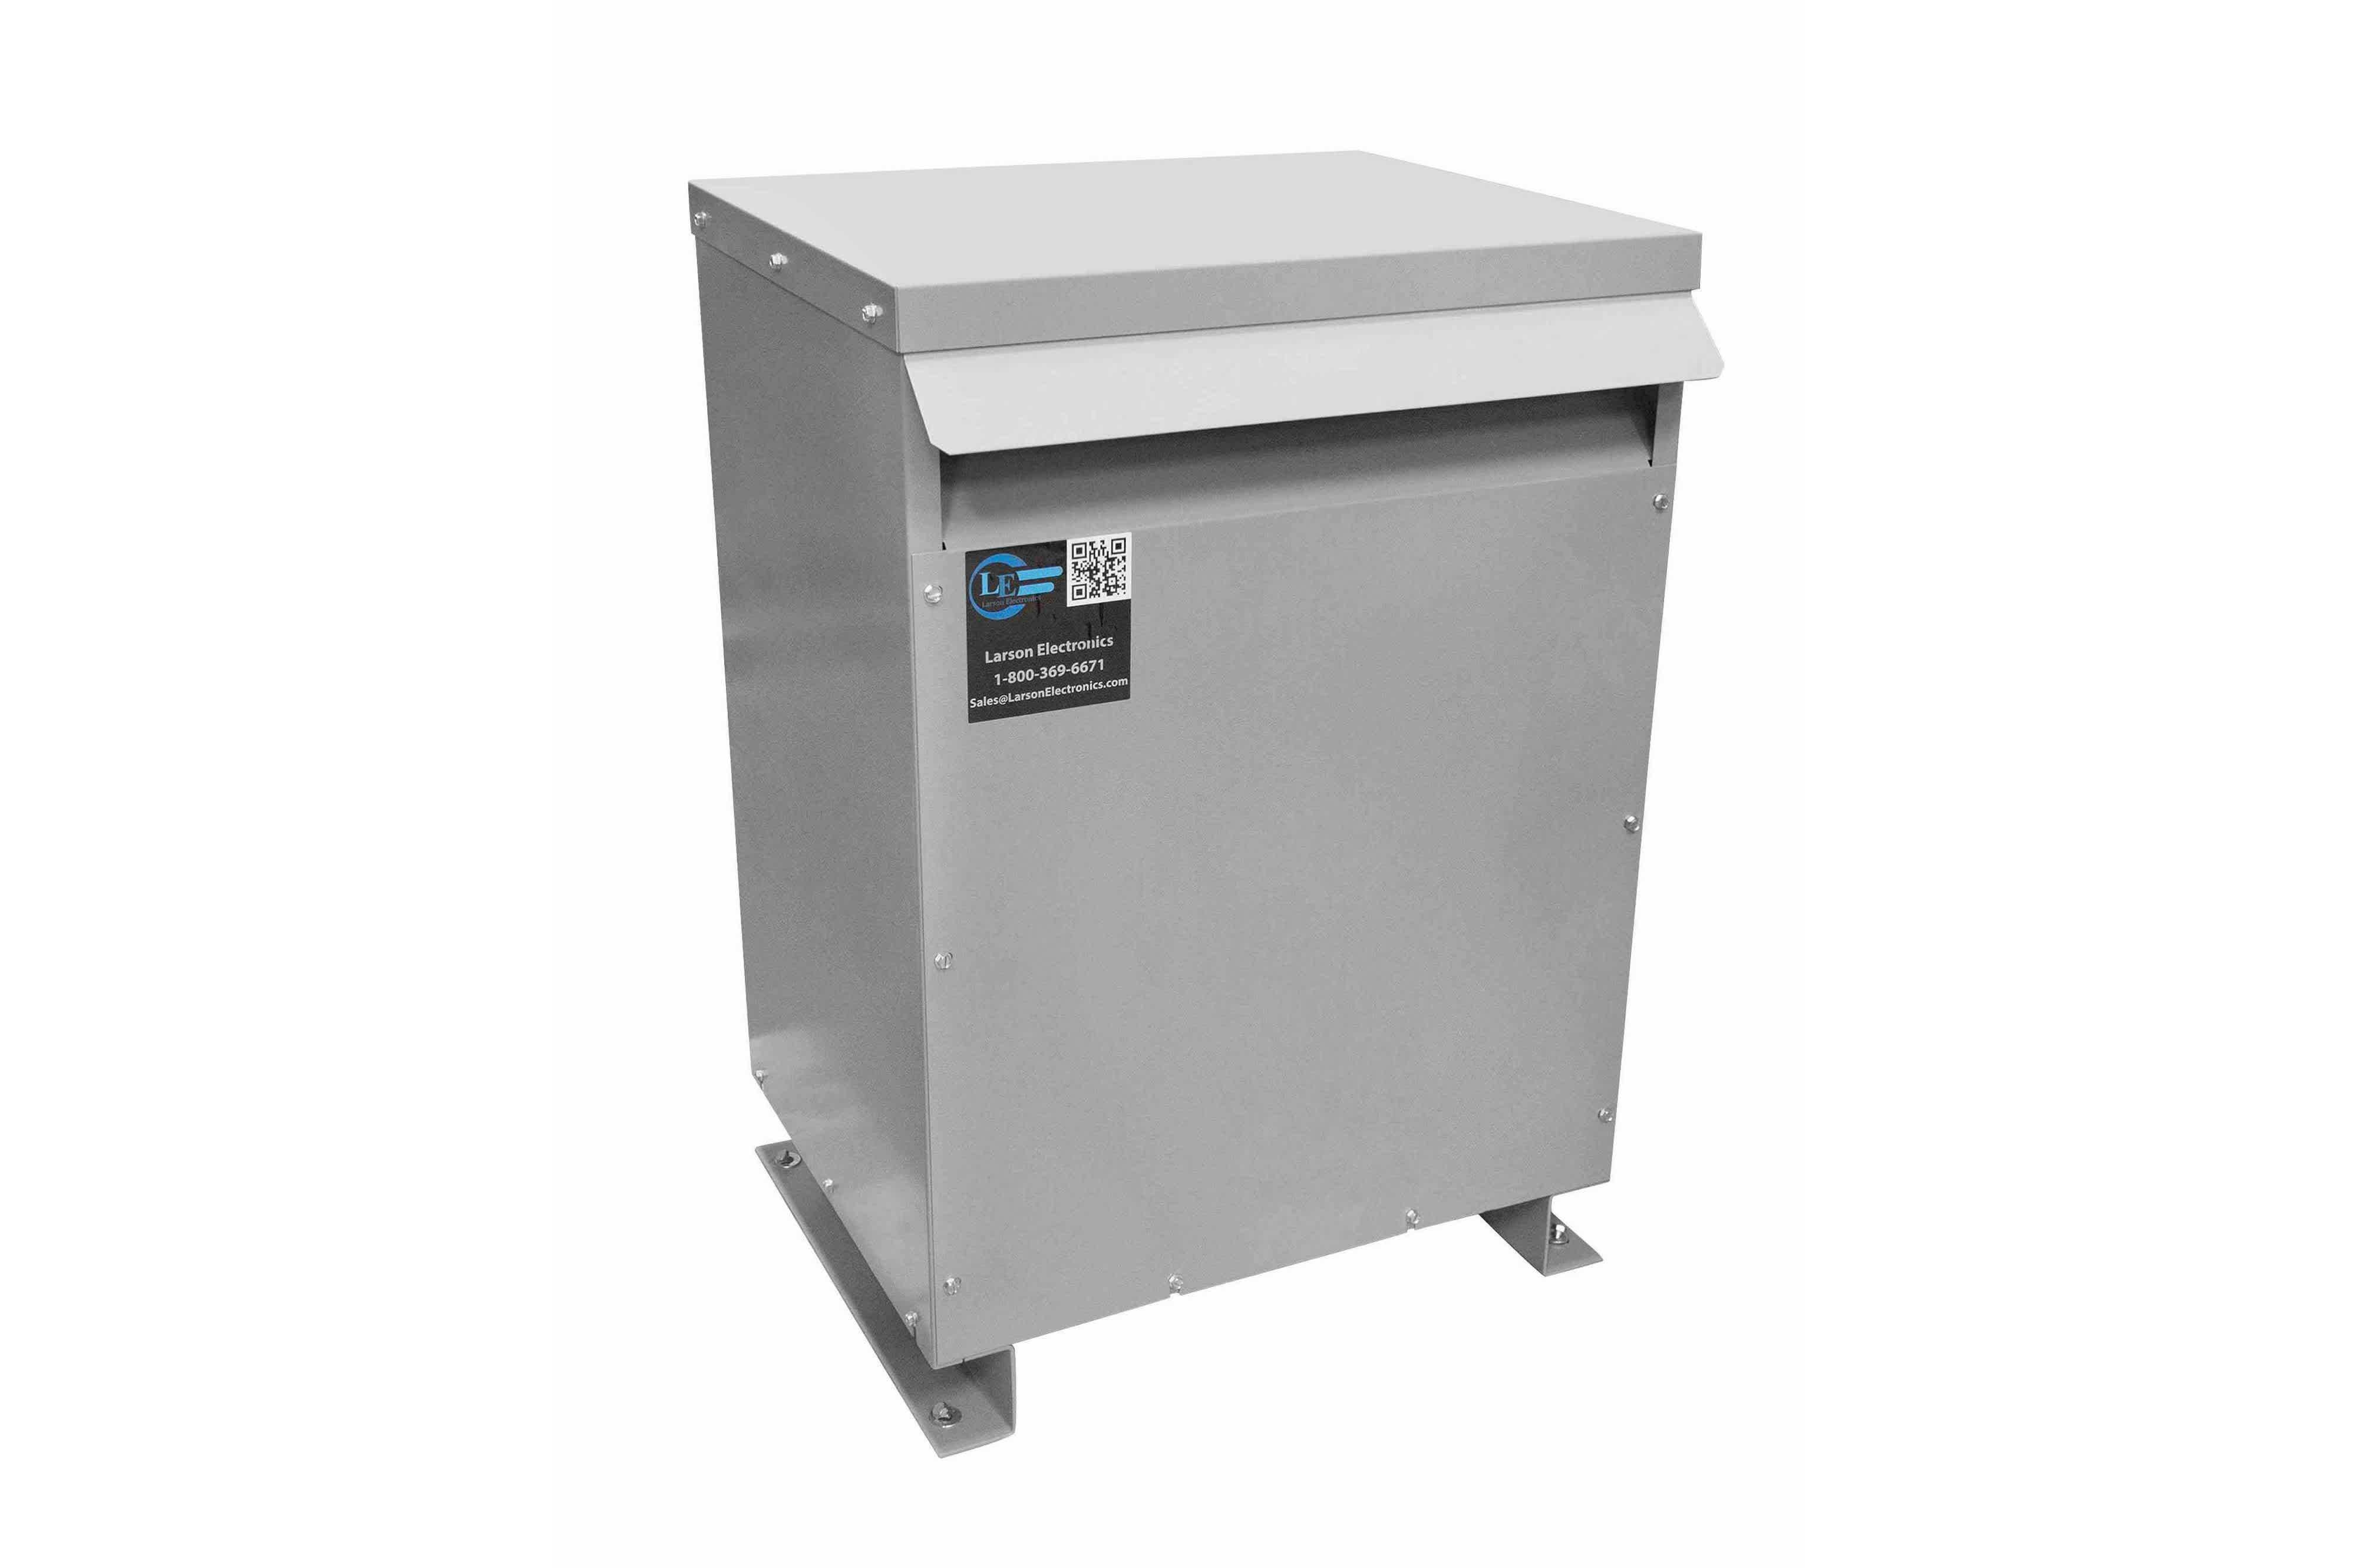 12 kVA 3PH Isolation Transformer, 600V Wye Primary, 460Y/266 Wye-N Secondary, N3R, Ventilated, 60 Hz